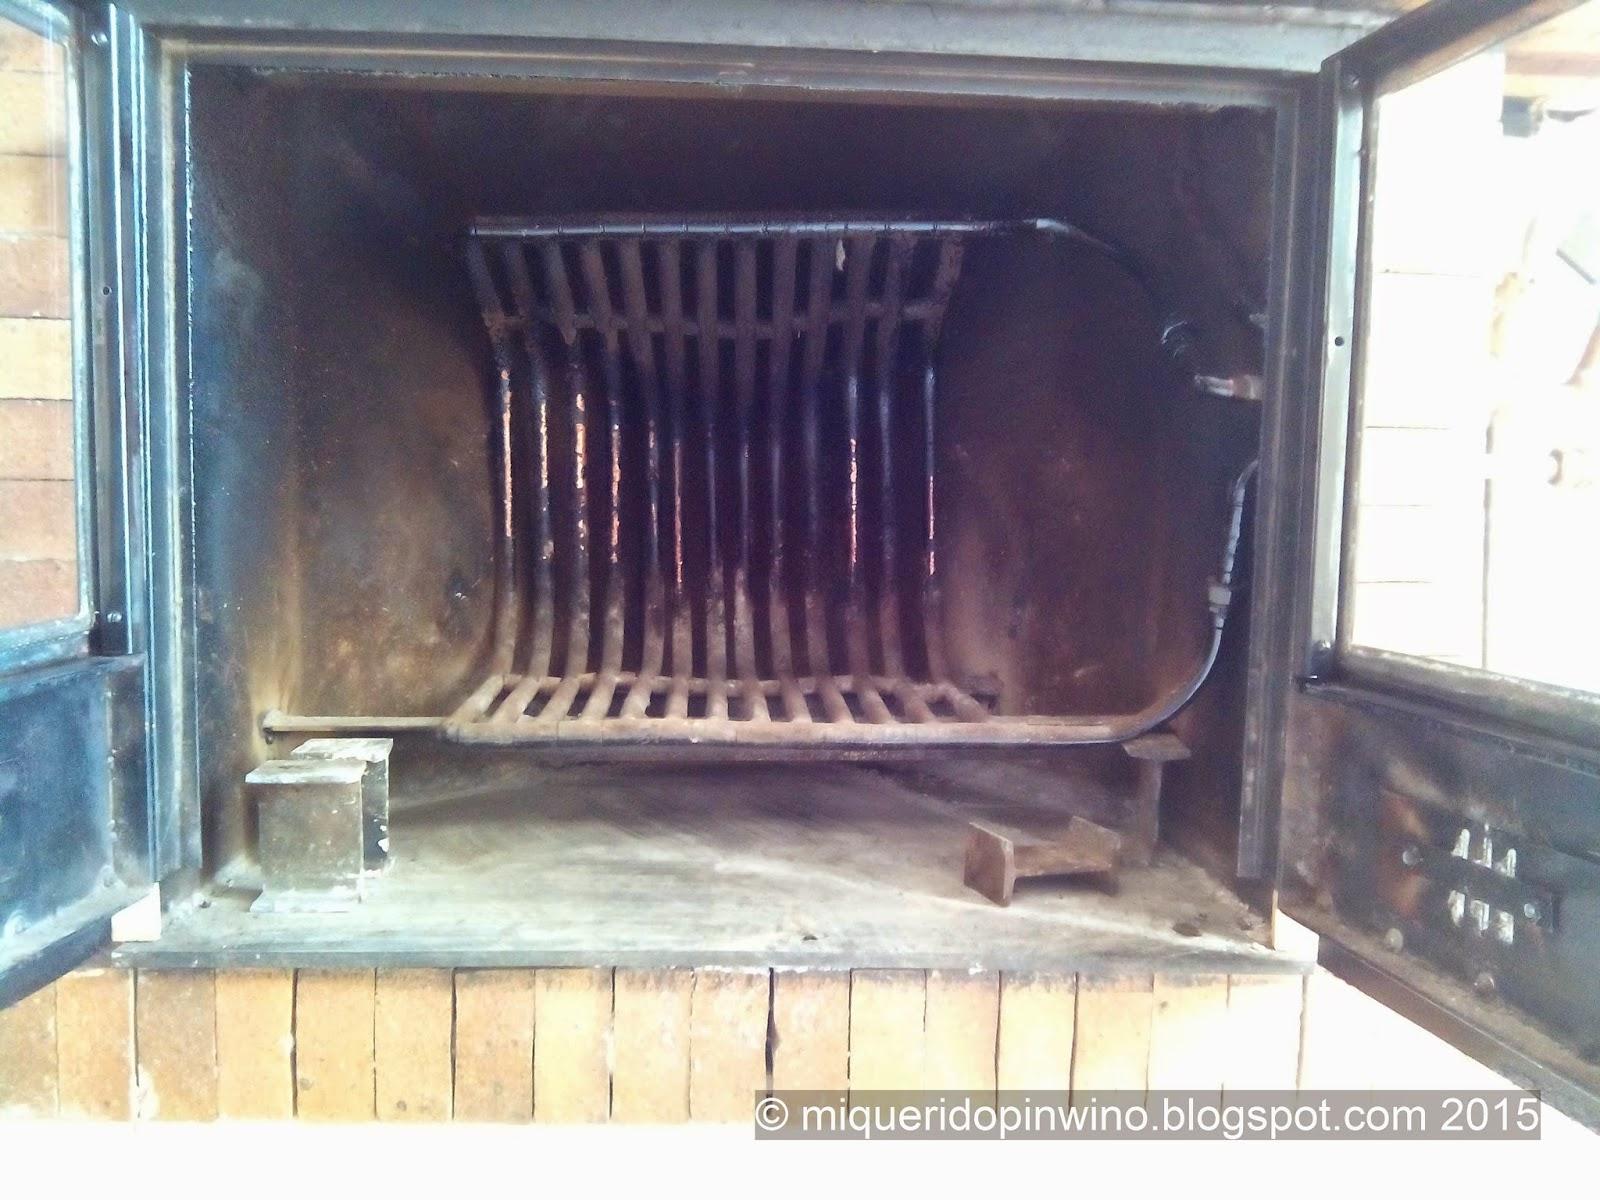 Tecnolog a para un progreso sostenible c mo aprovechar una chimenea abierta para calefacci n - Calefaccion con chimenea de lena ...